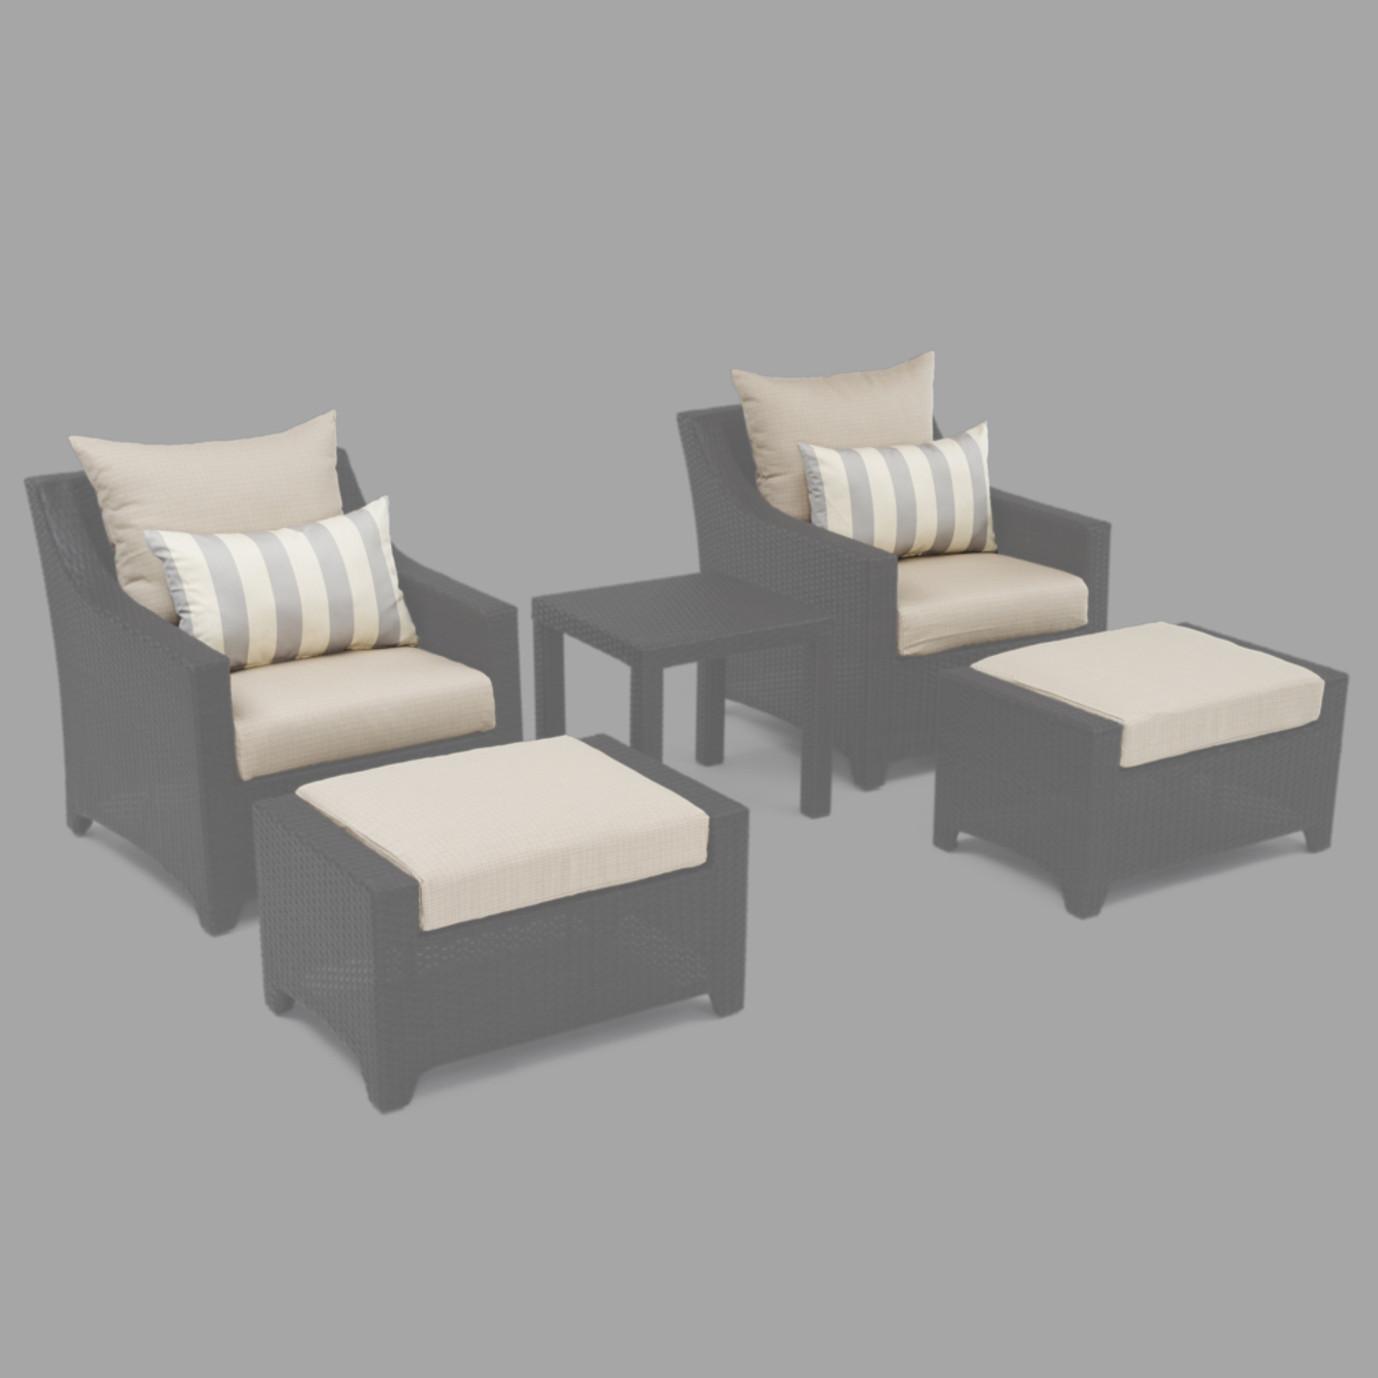 Modular Outdoor 5pc Club Cushion Cover Set - Slate Grey